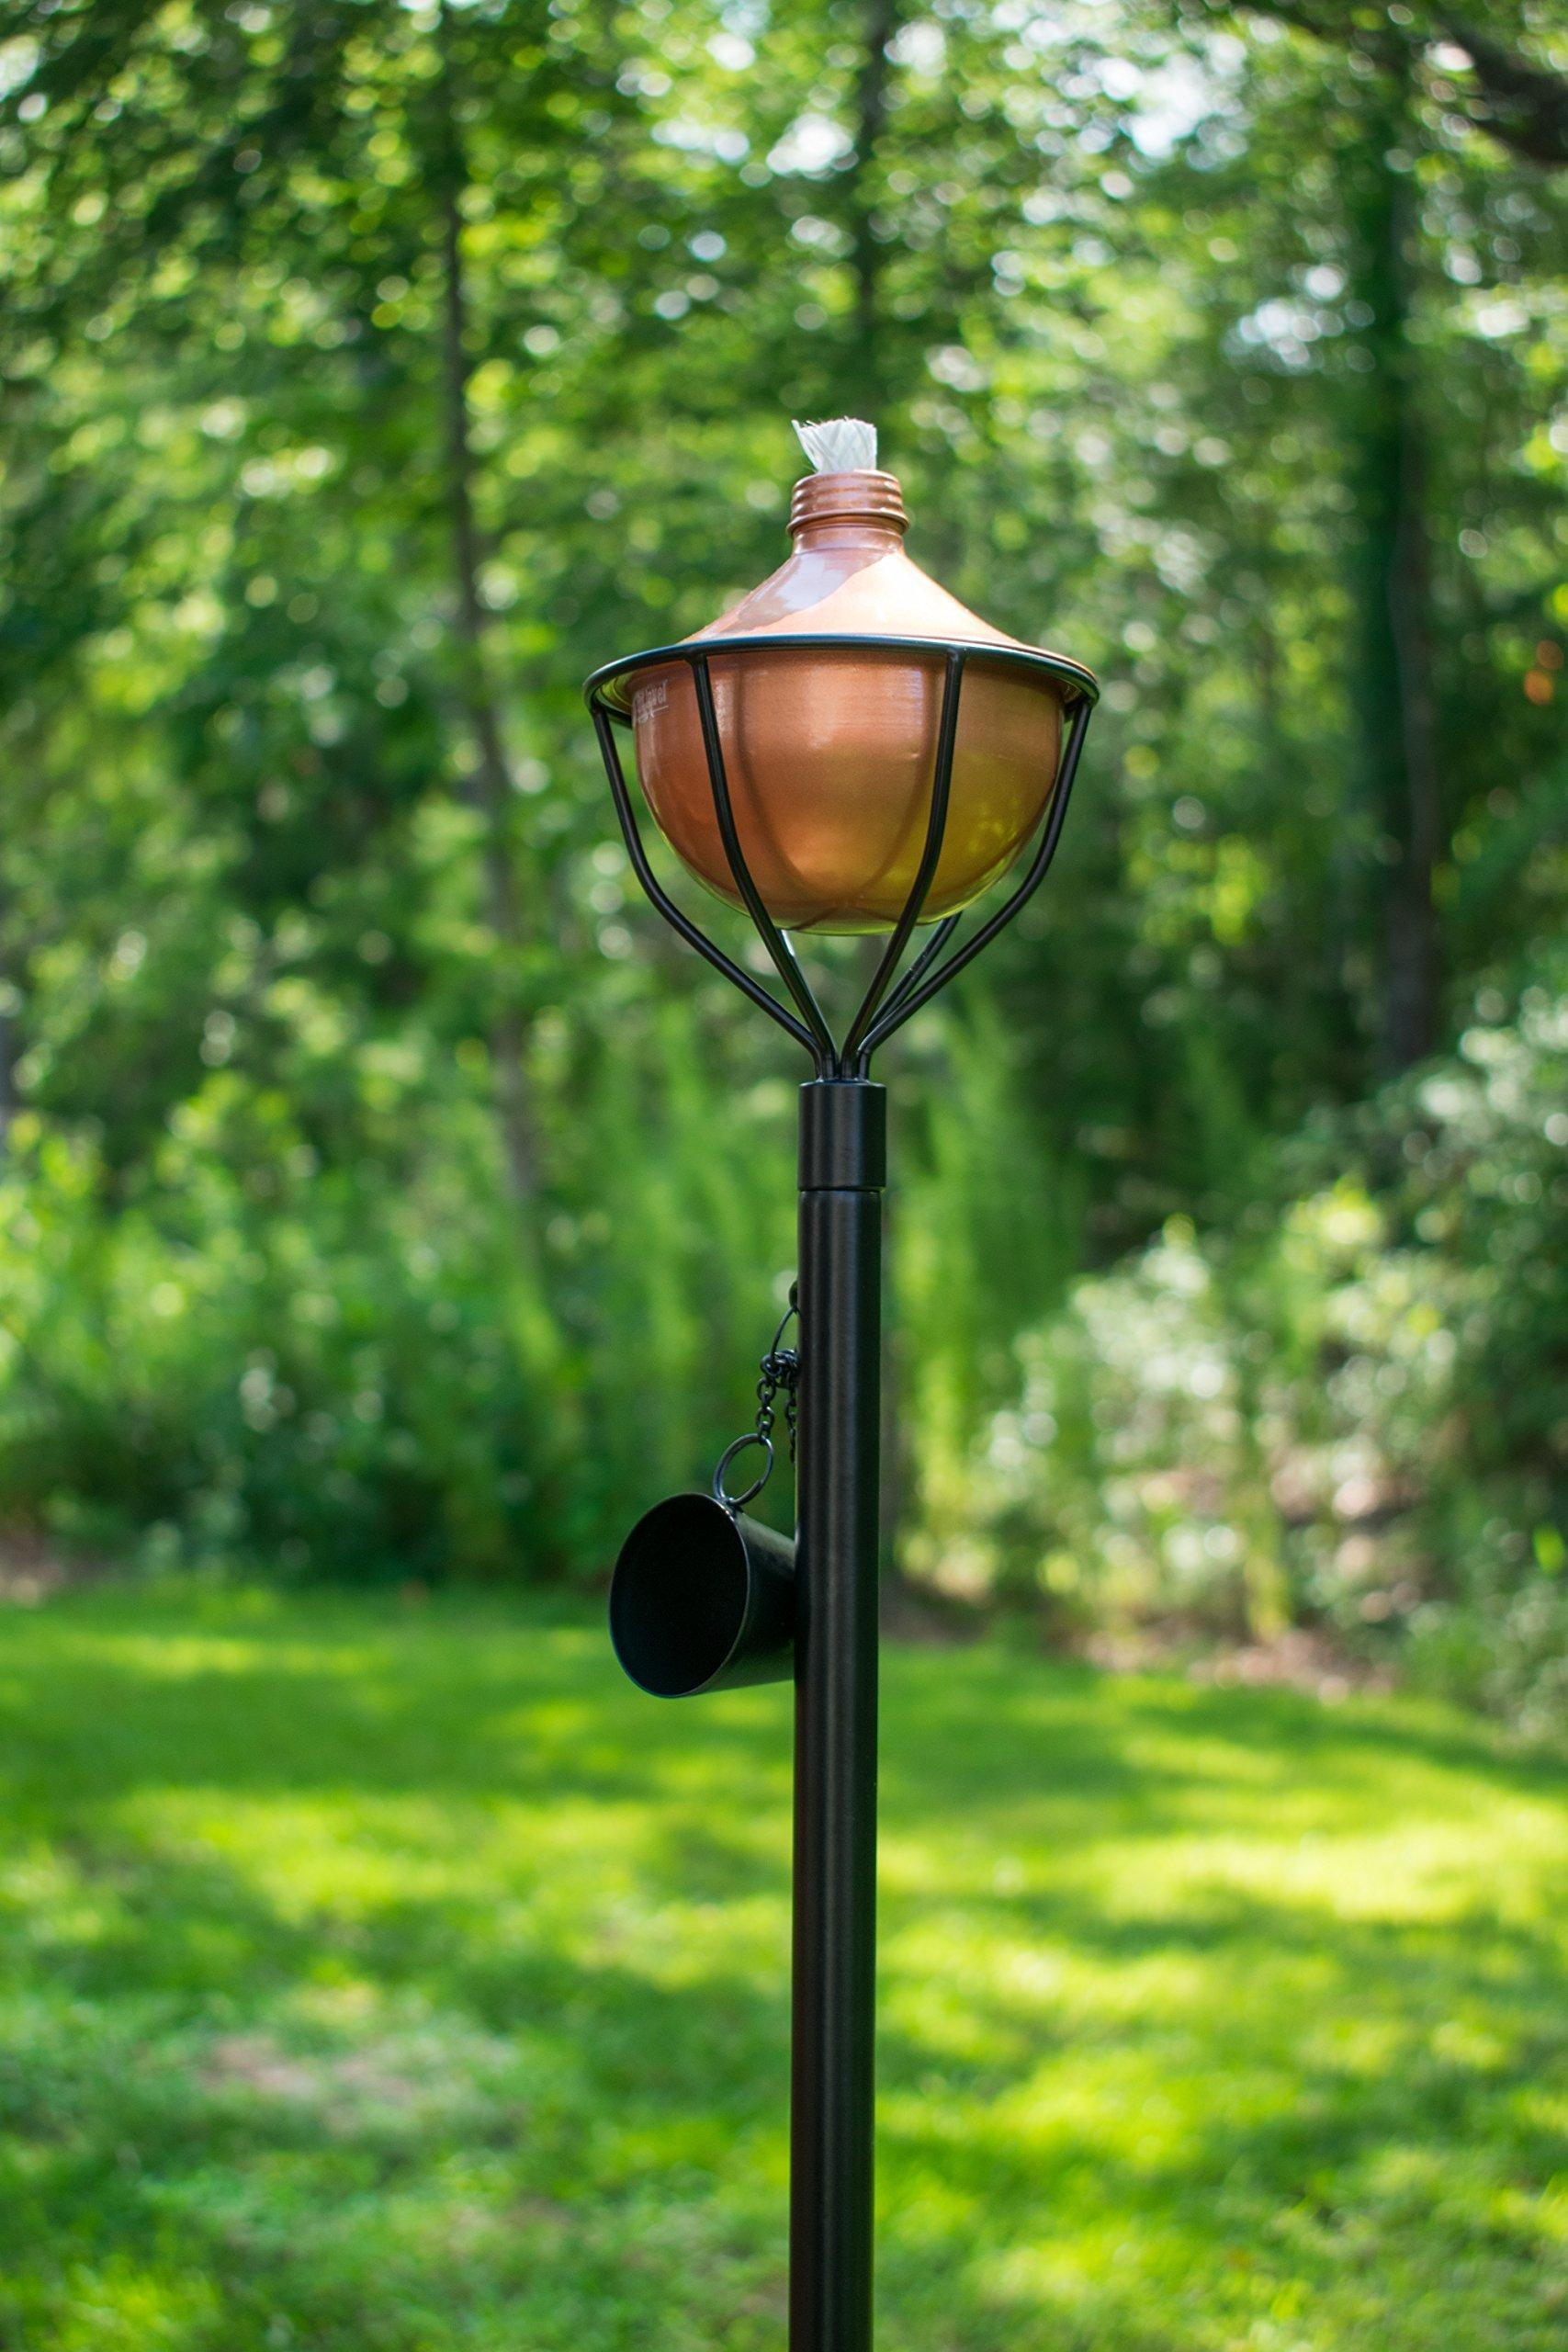 Dusq All-In-One Citronella Garden Torch Modern Copper Finish by Dusq (Image #1)